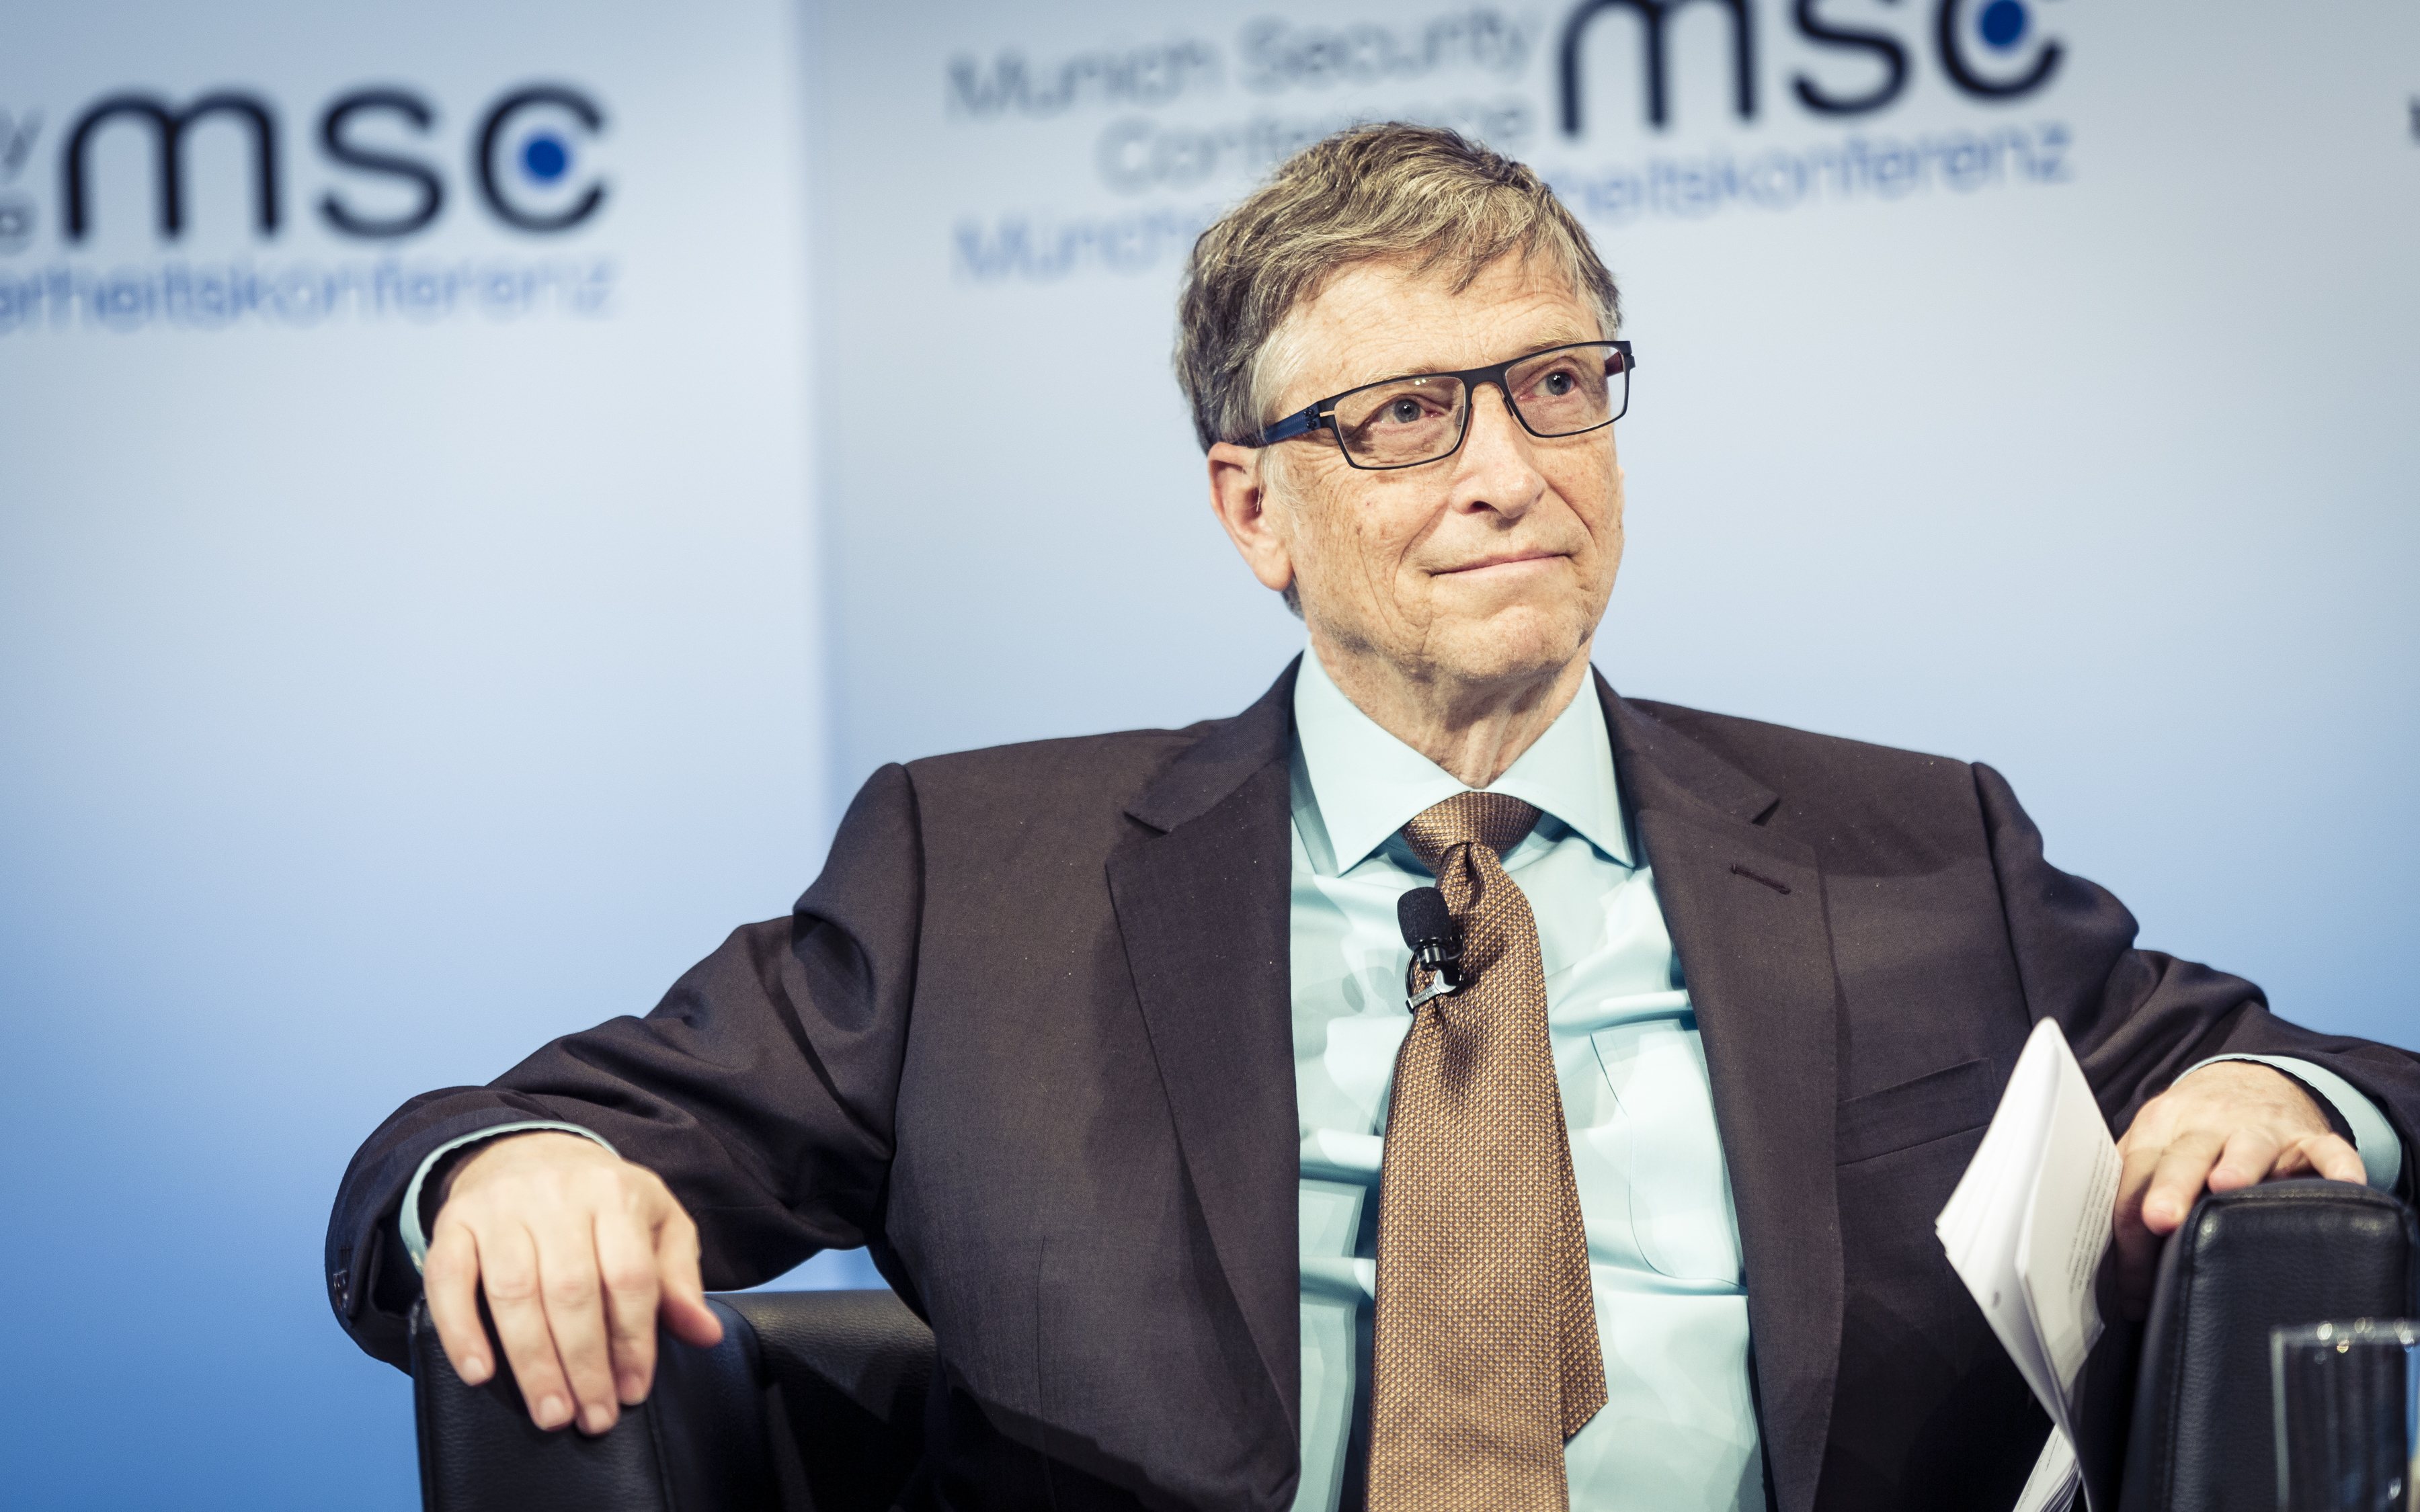 Bill_Gates_WLTH_Blog